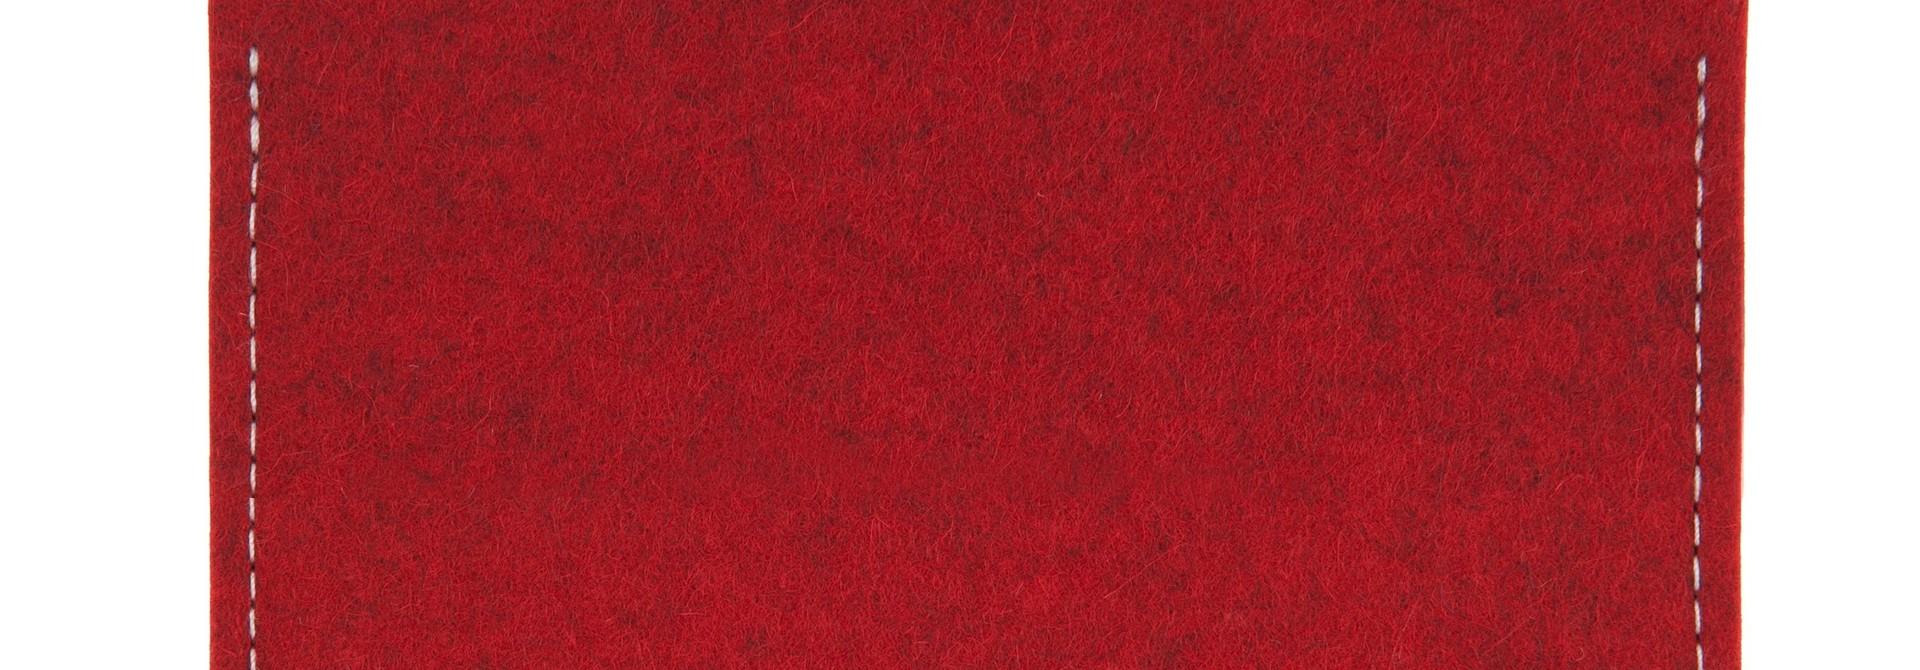 AirPods Sleeve Cherry